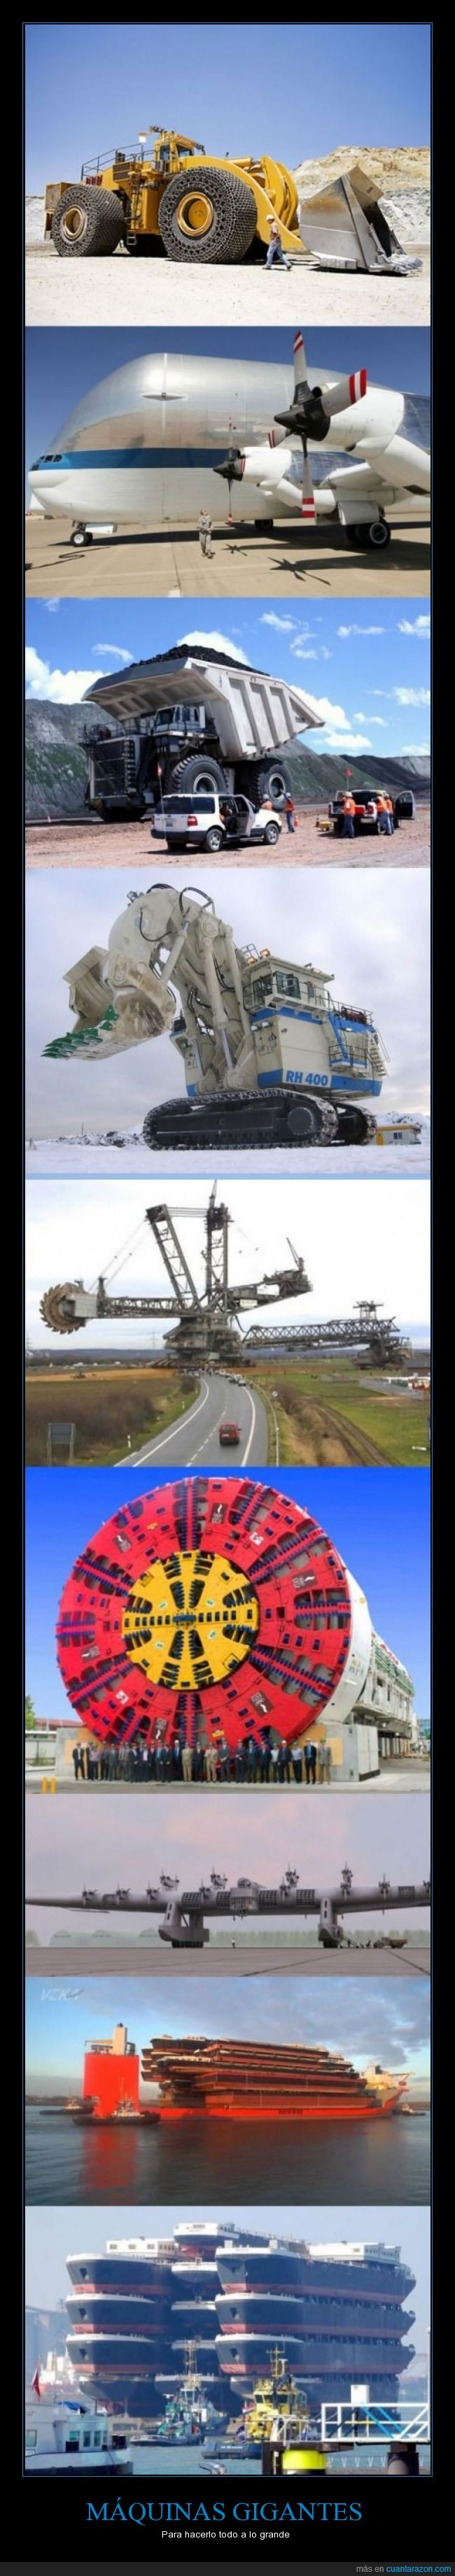 barco,gigante,grande,máquina,maquinaria,pequeño,potente